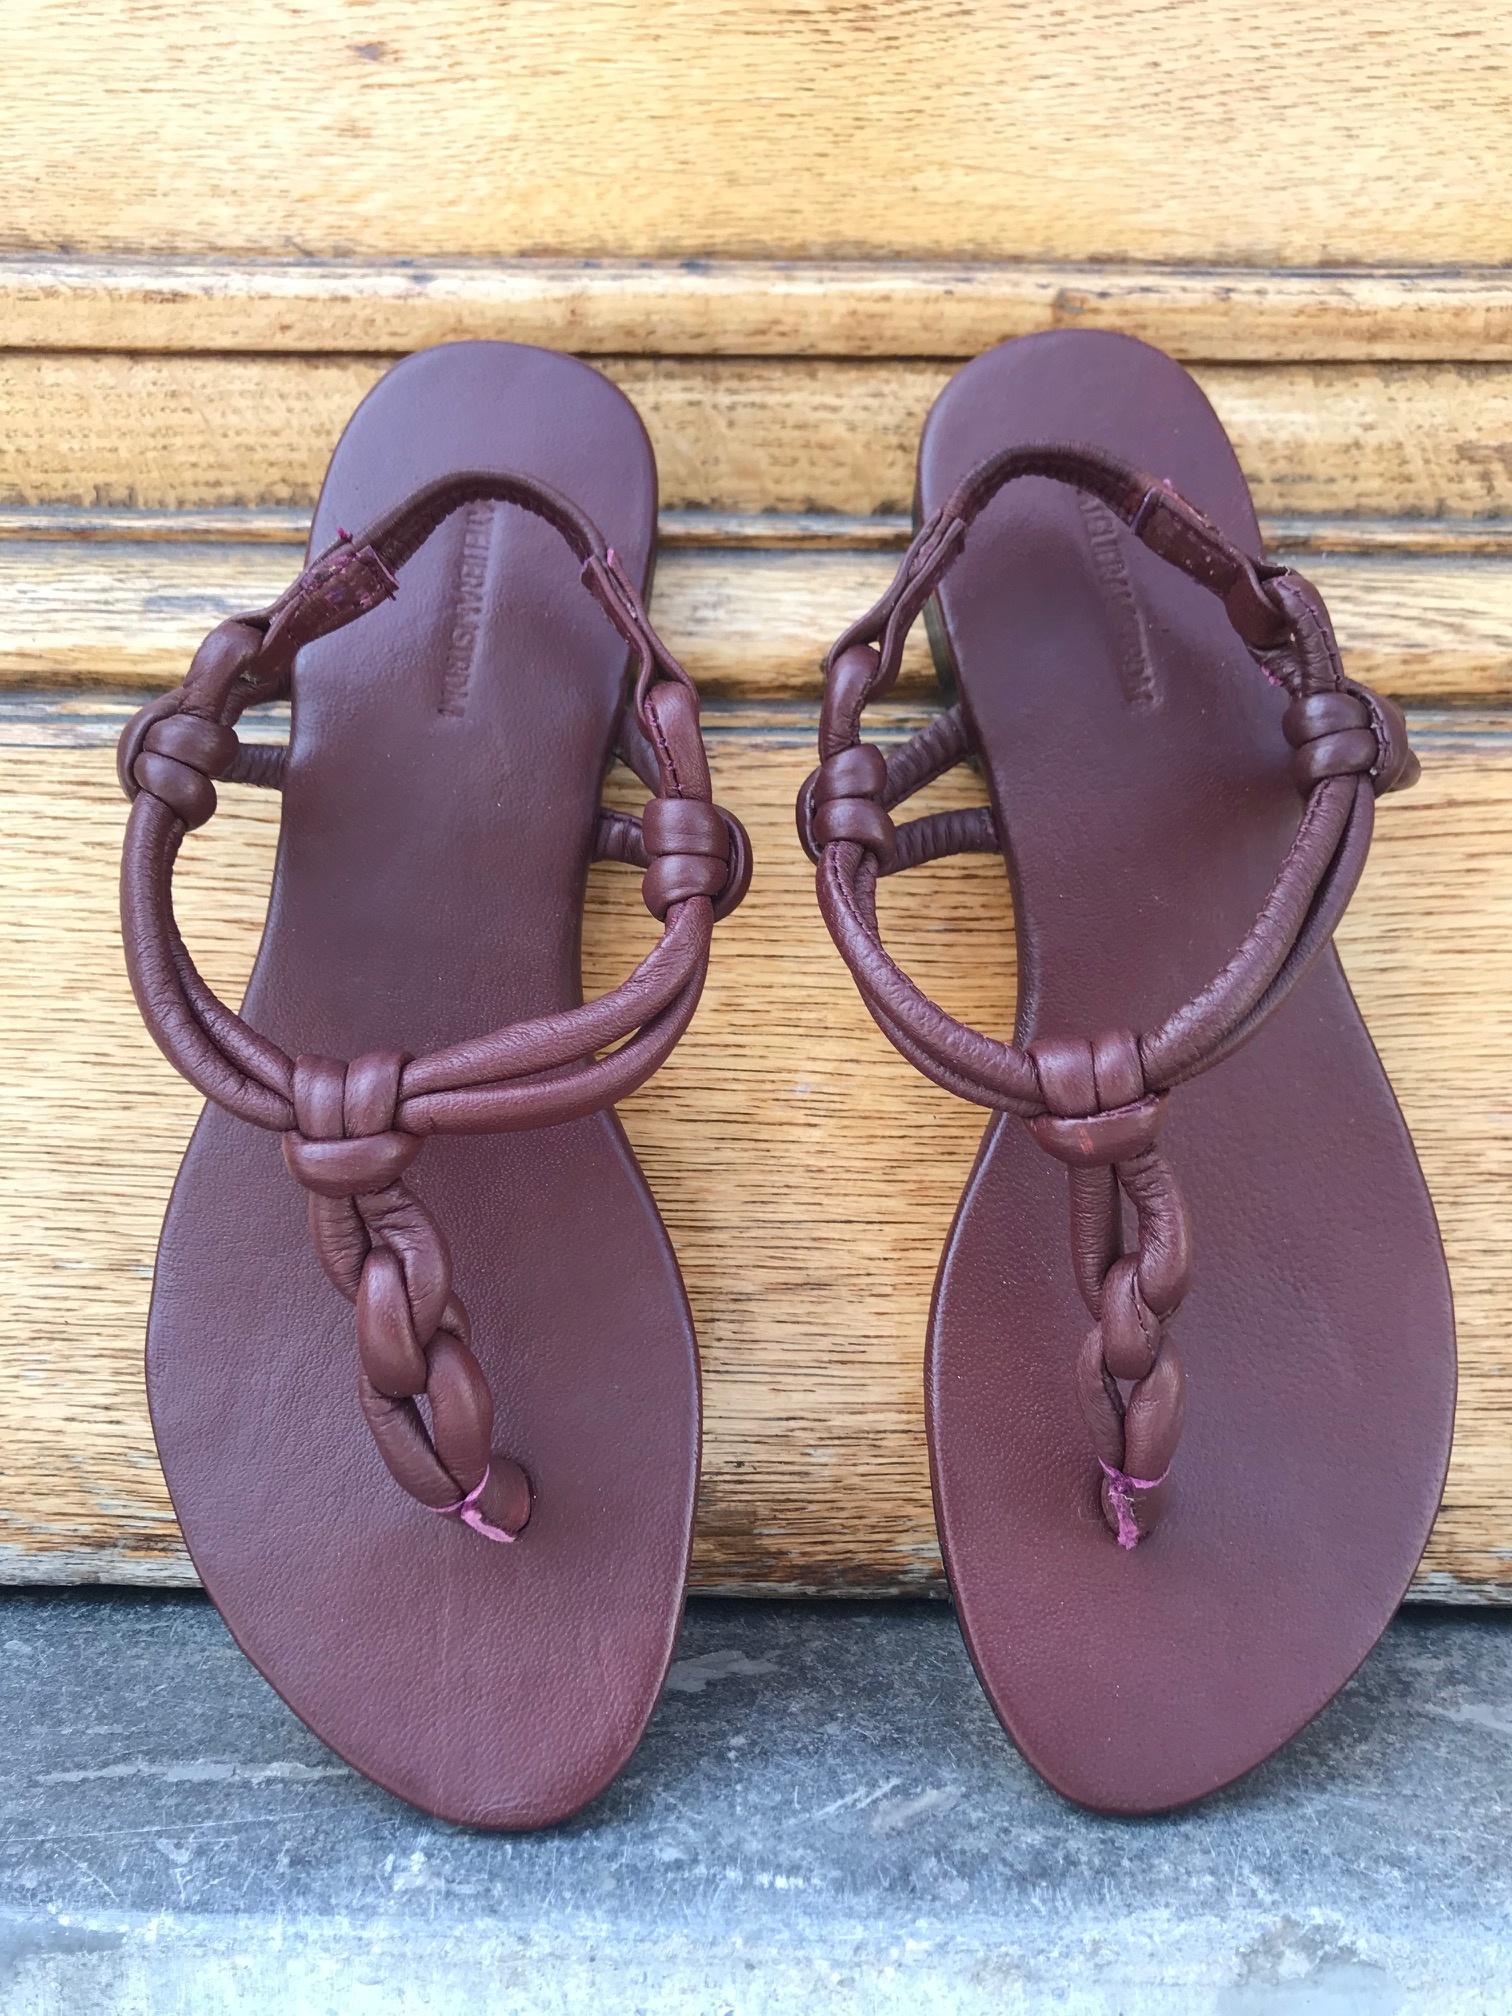 ATELIERAMSTRDM Knot Sandal 38